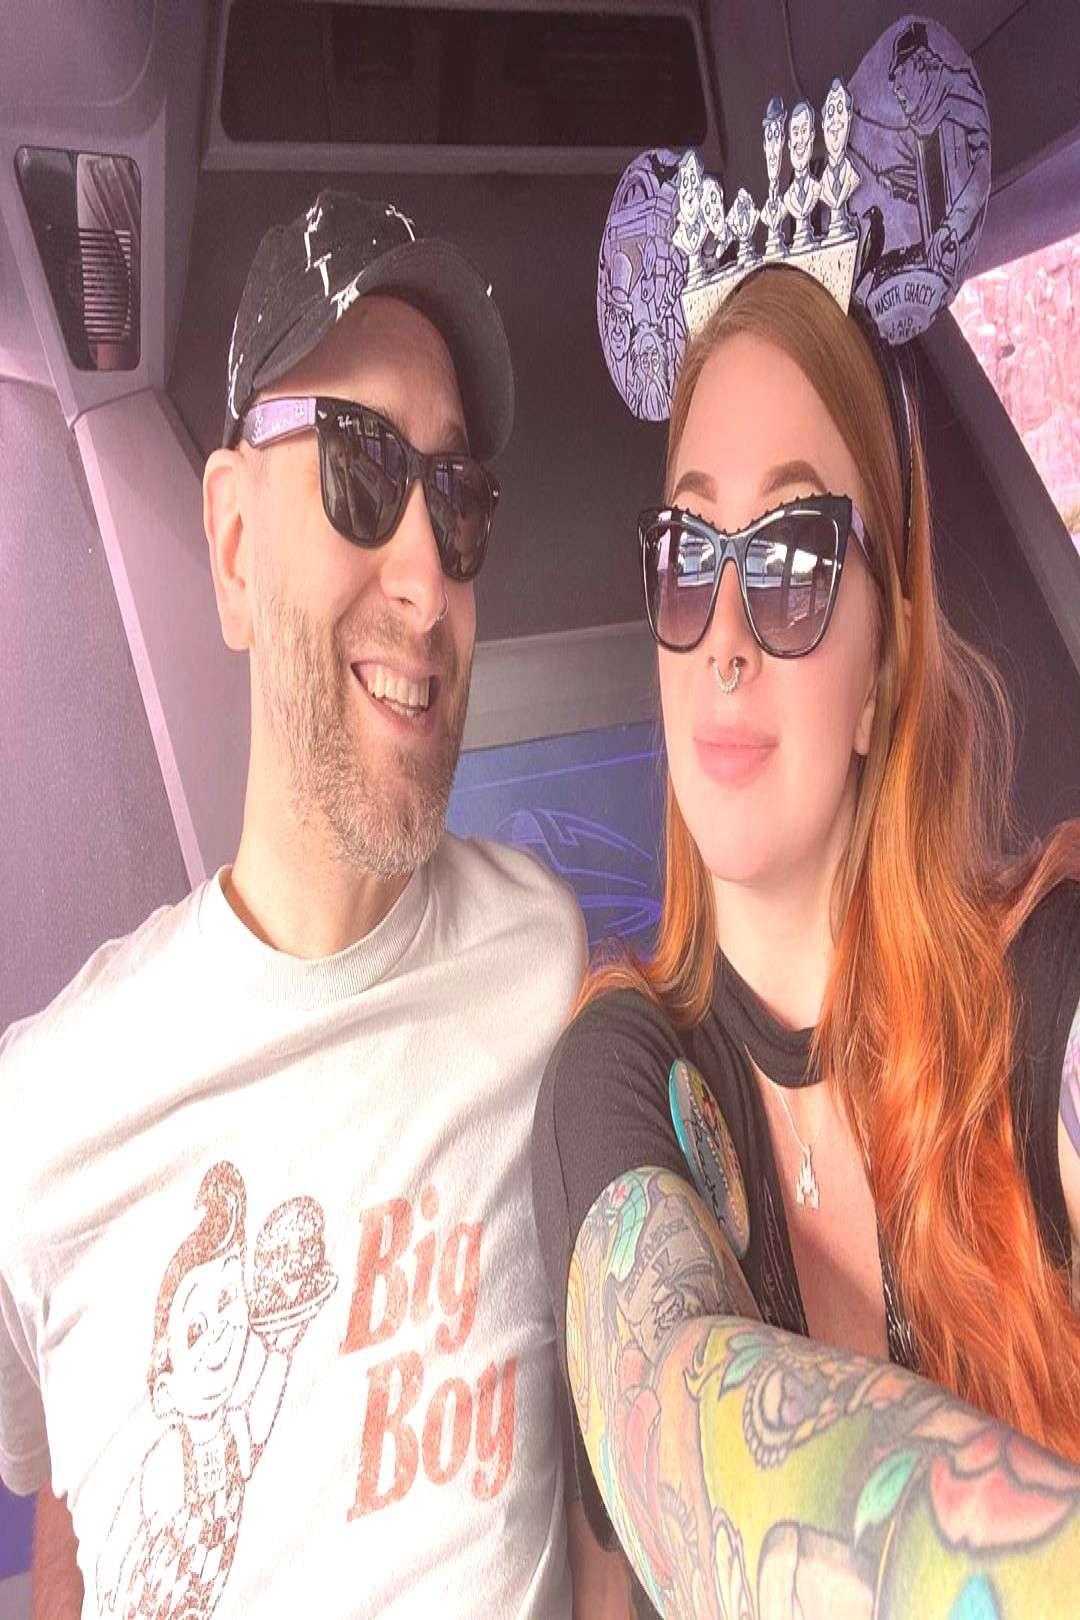 #raybansunglasses #sunglasses #closeup #people #and #2 2 people sunglasses and closeupYou can find Ray ban sunglasses and more on our website.2 people sunglasses and closeup